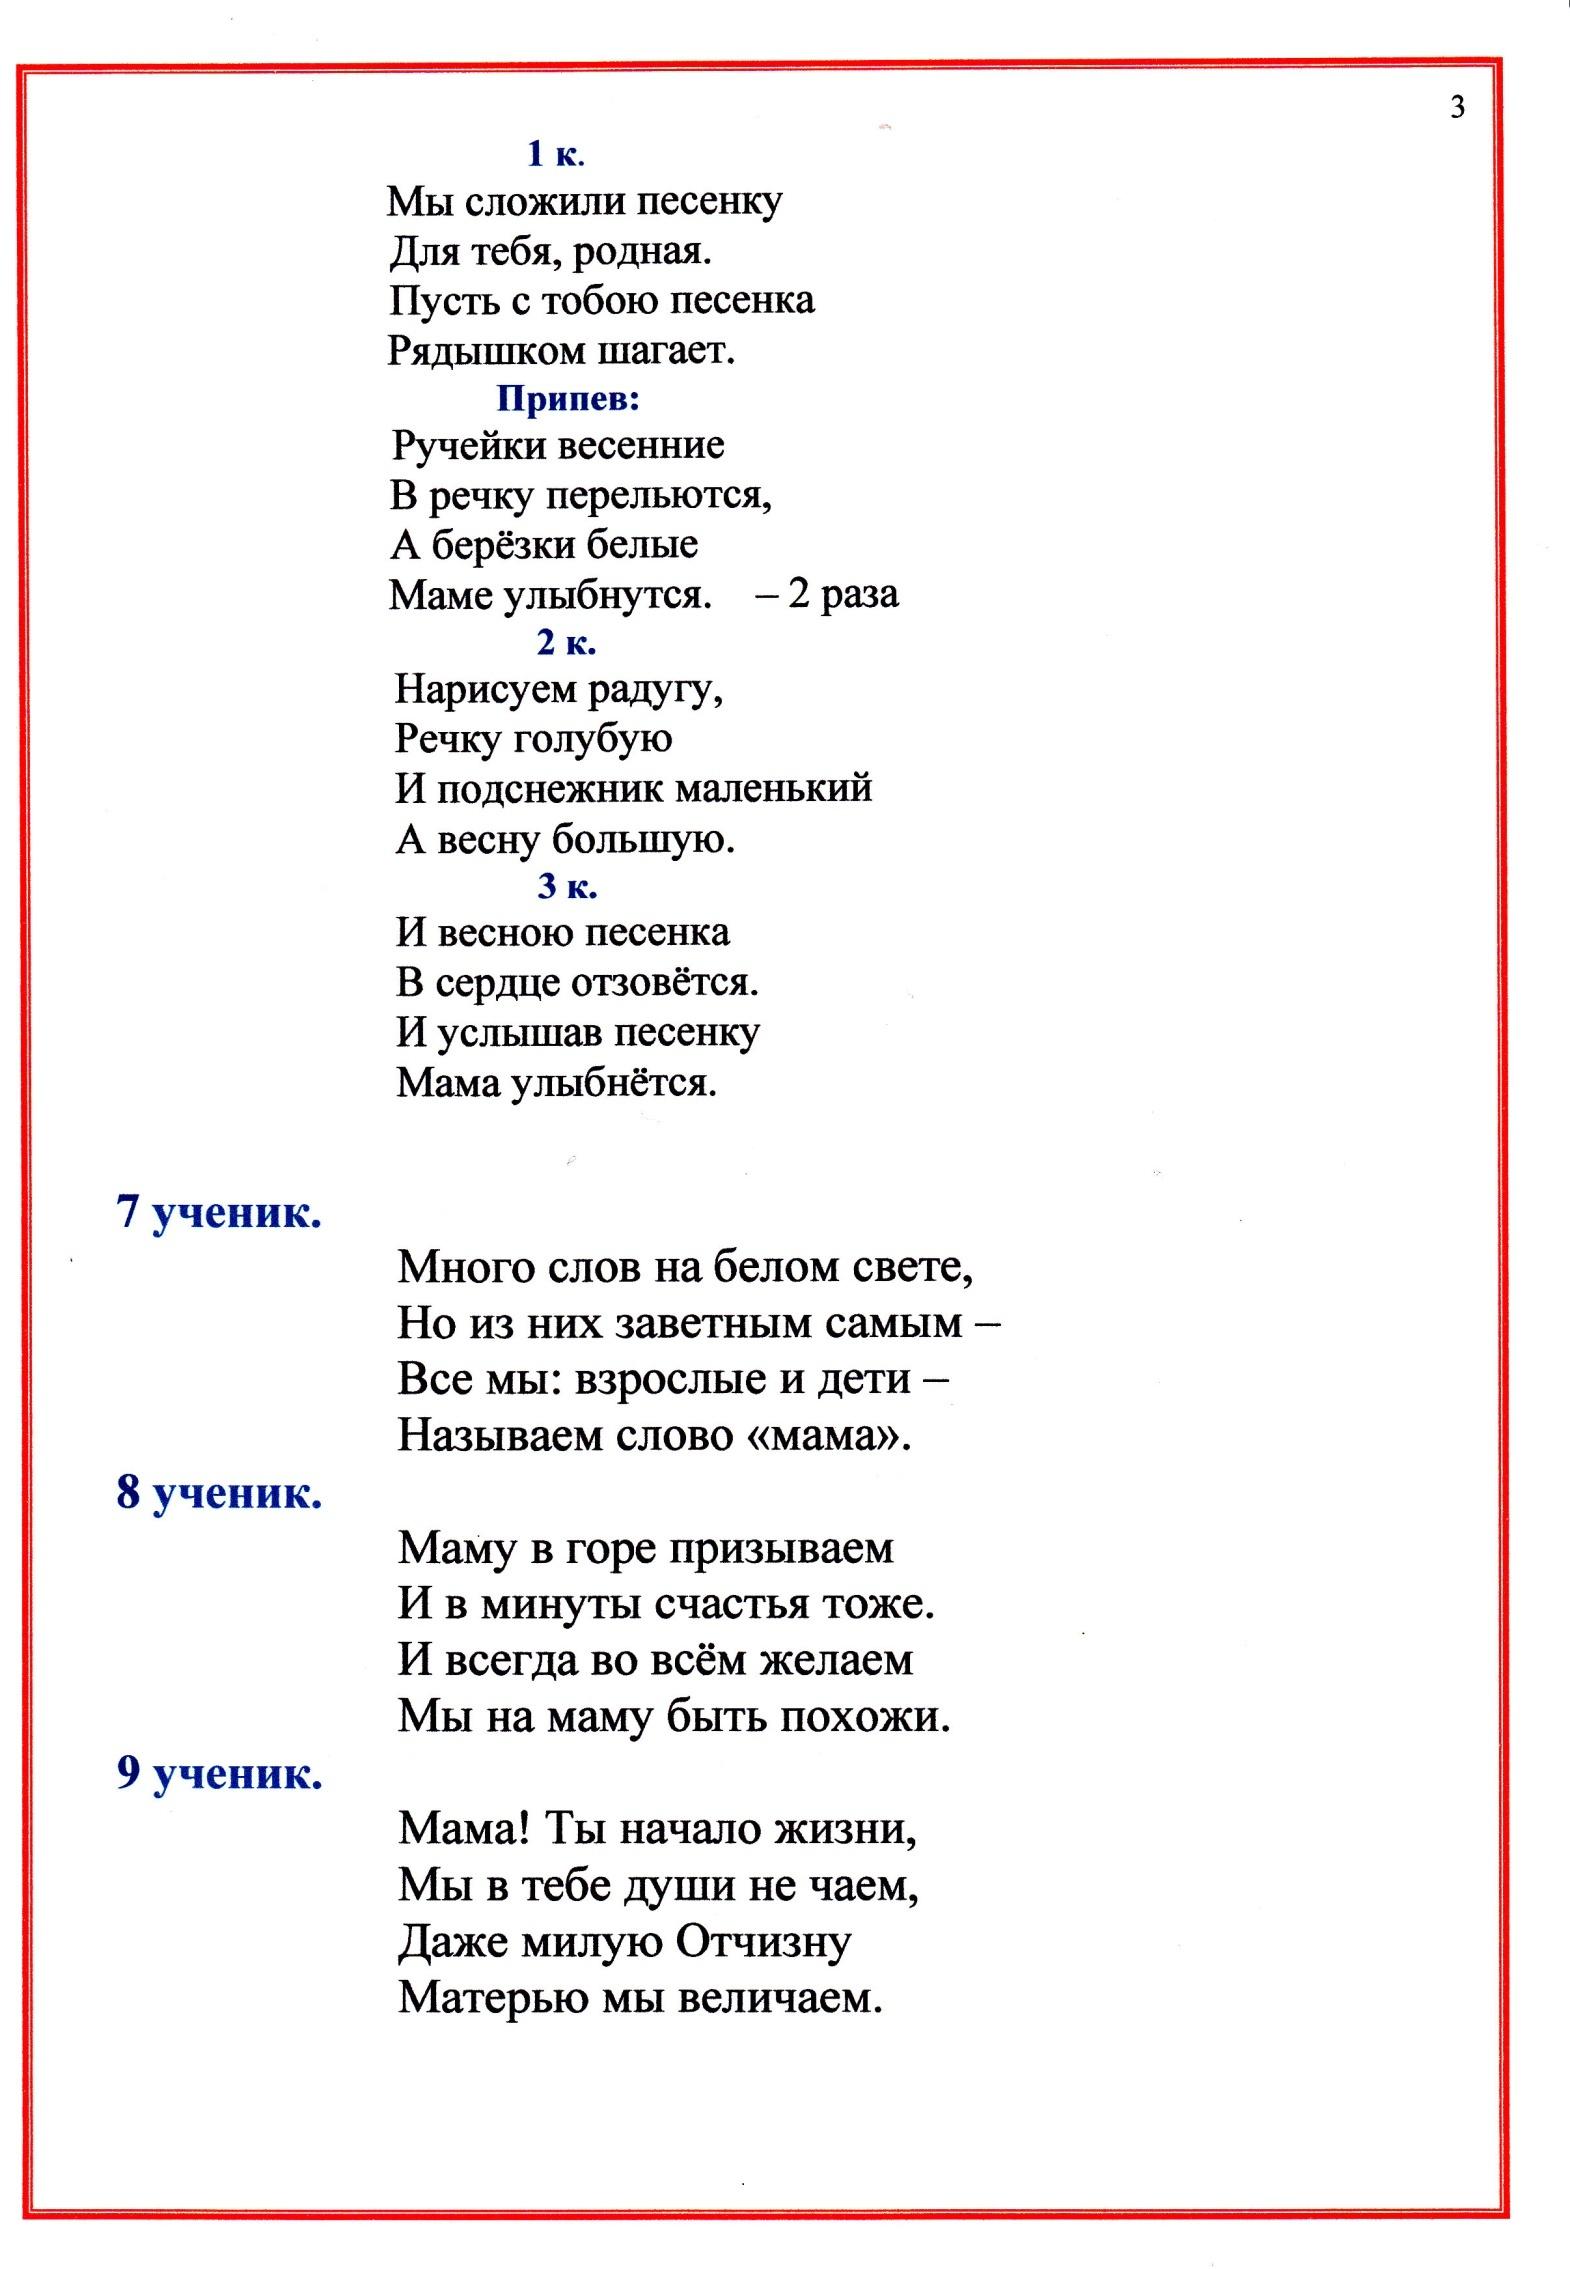 C:\Documents and Settings\Admin\Мои документы\Мои рисунки\MP Navigator EX\2009_12_01\IMG_0002.jpg